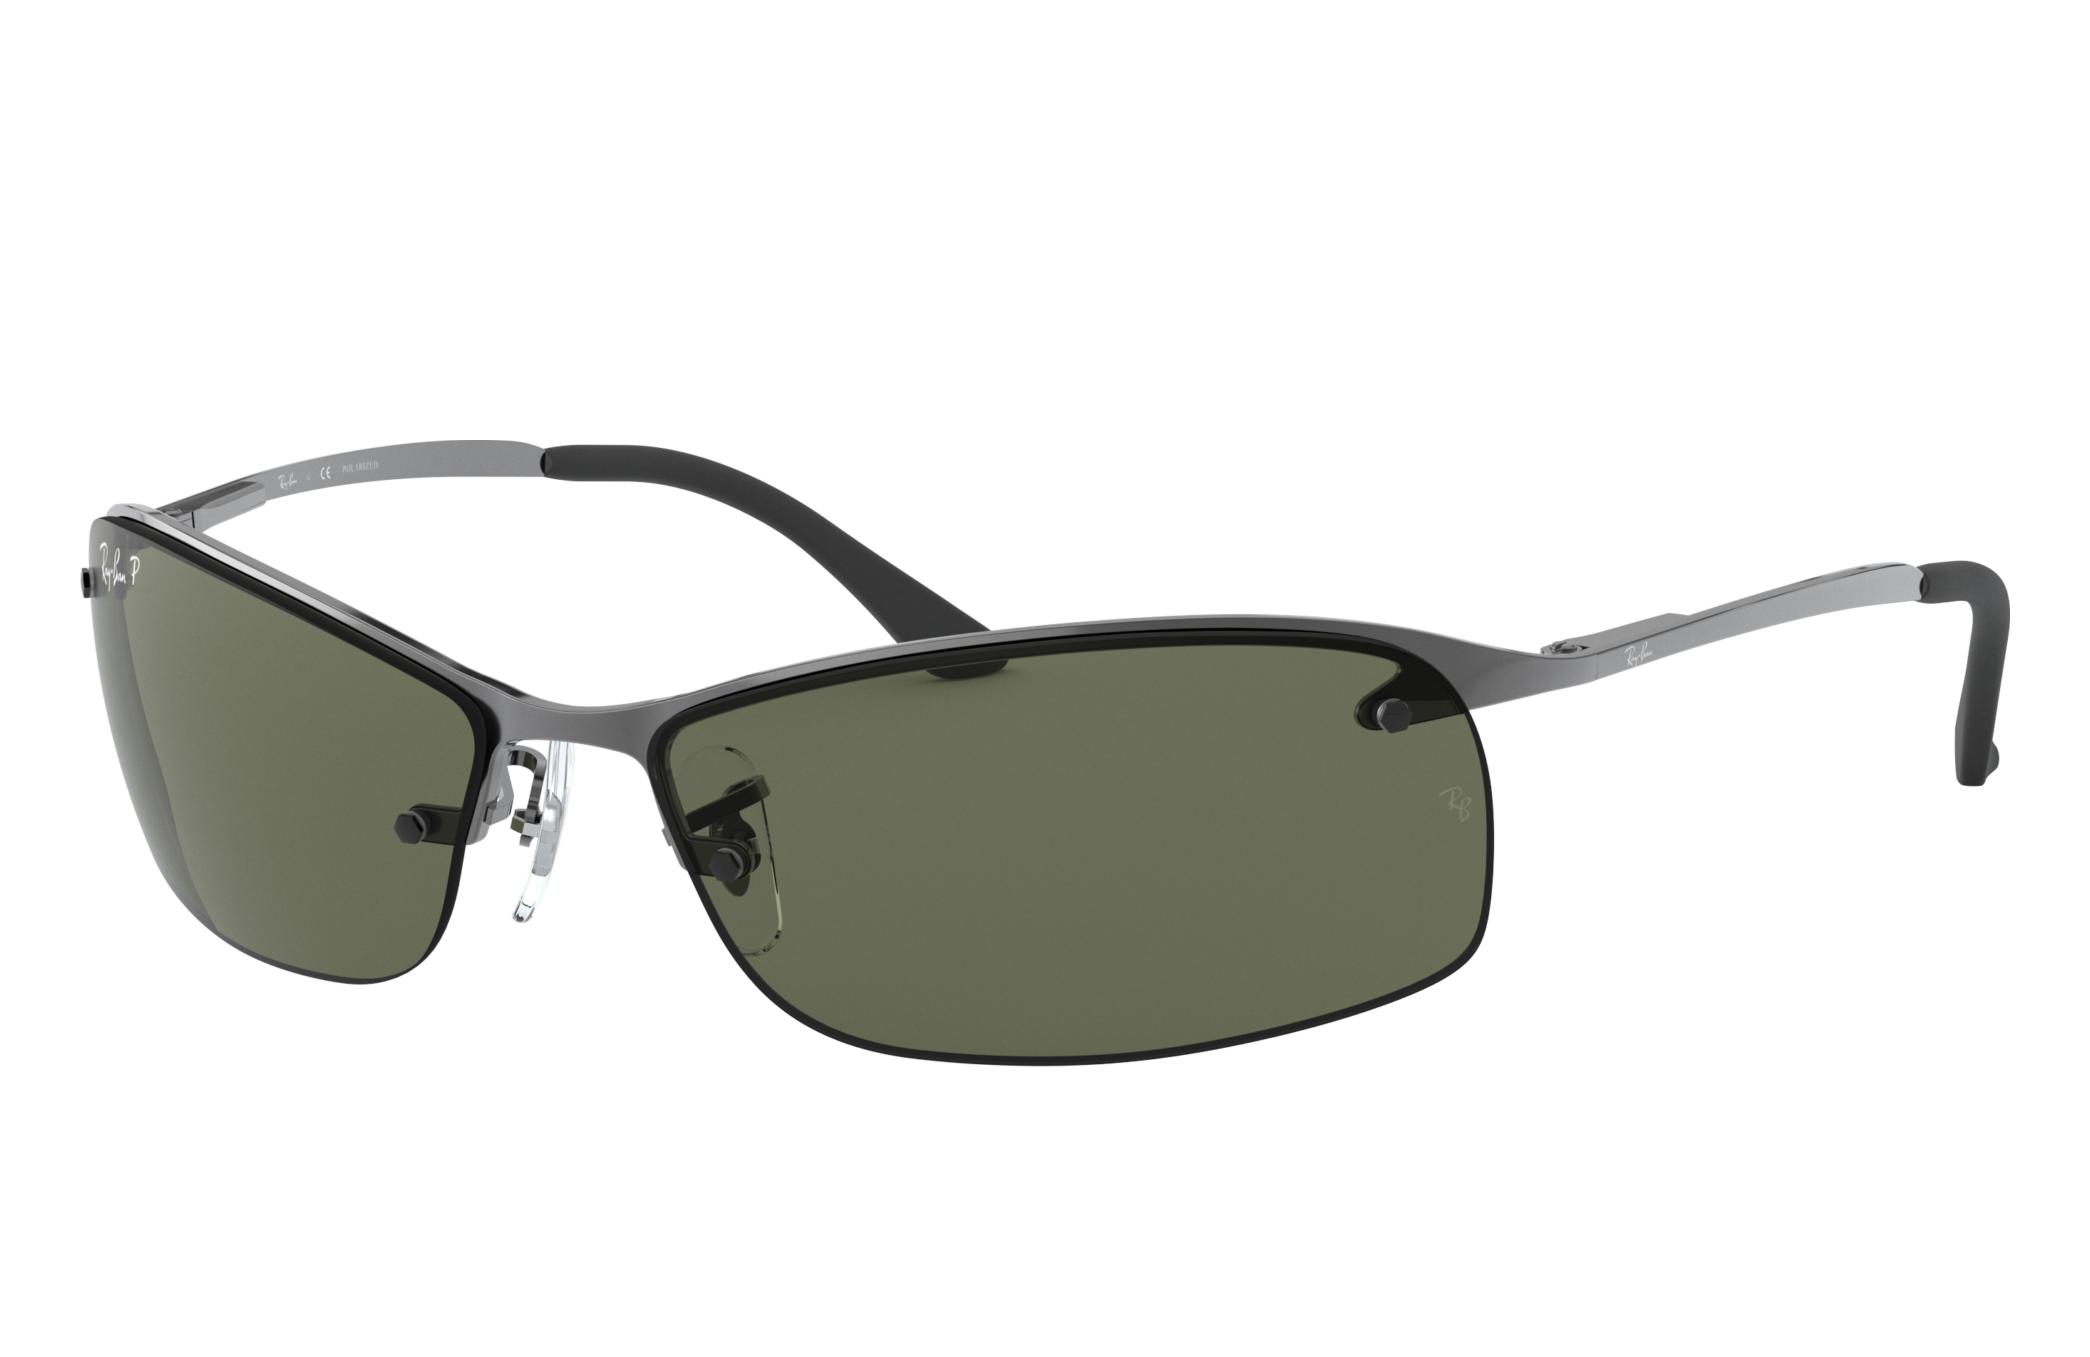 Ray-Ban Rb3183 Gunmetal, Polarized Green Lenses - RB3183